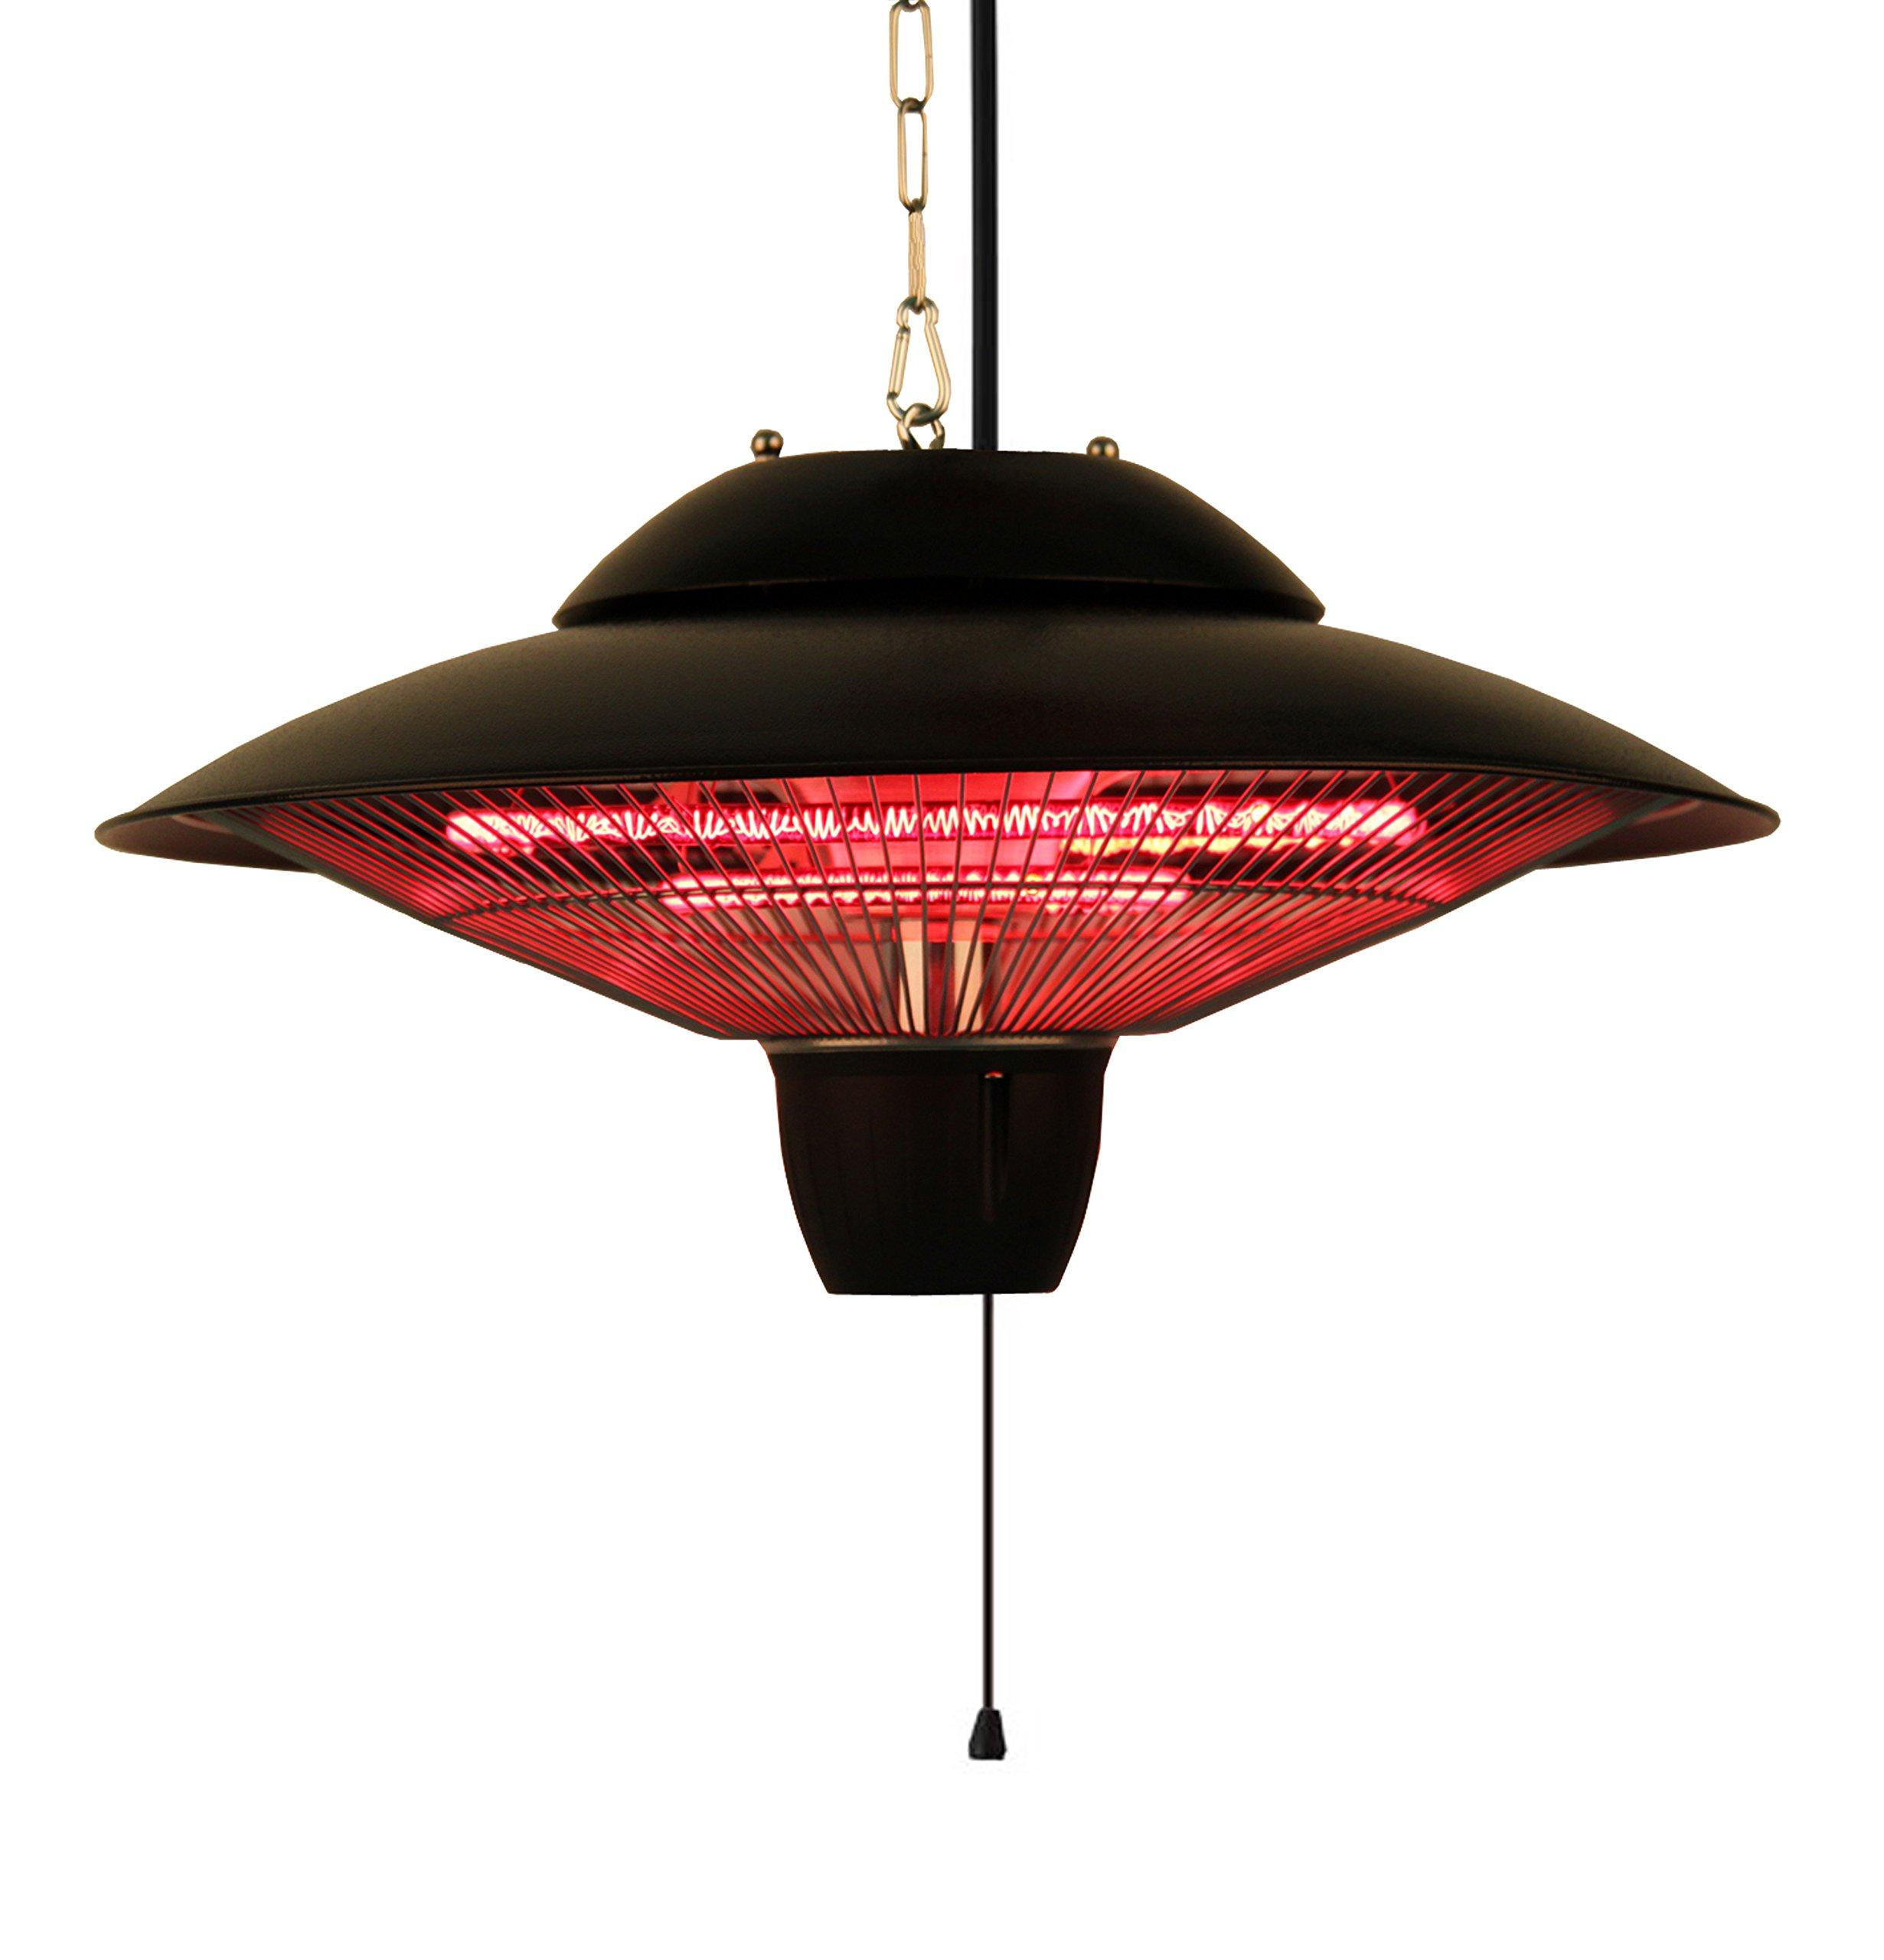 Ener-G+ Indoor/Outdoor Ceiling Electric Patio Heater, Black by Ener-G+